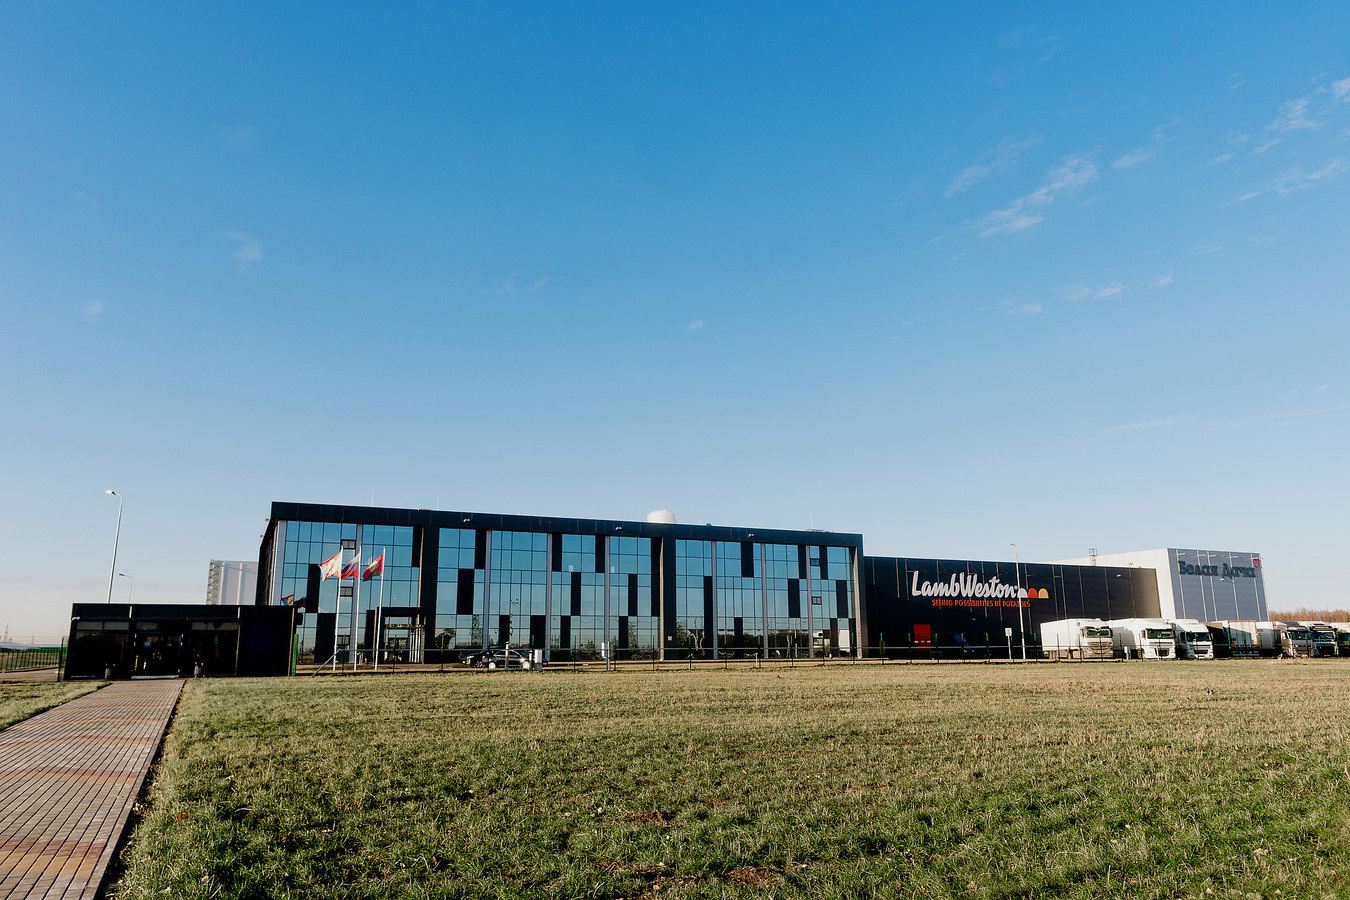 LWM RUS, de fabriek van Lamb Weston / Meijer in Rusland